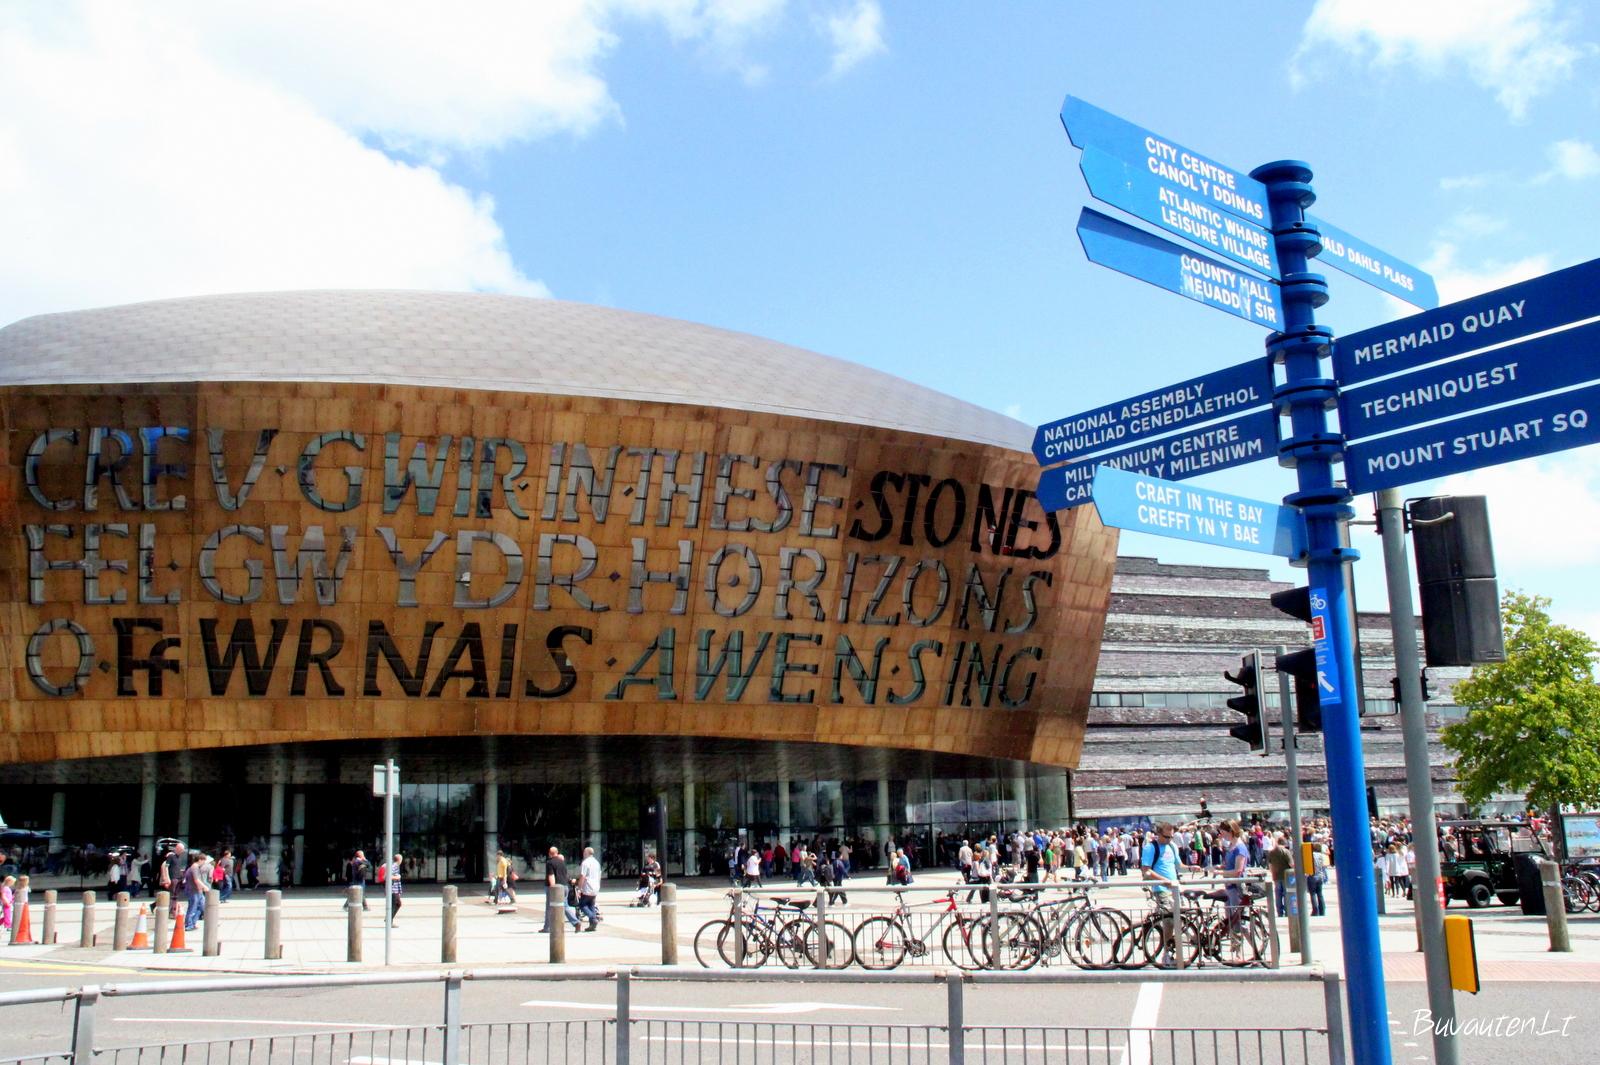 Velso Millenium centras